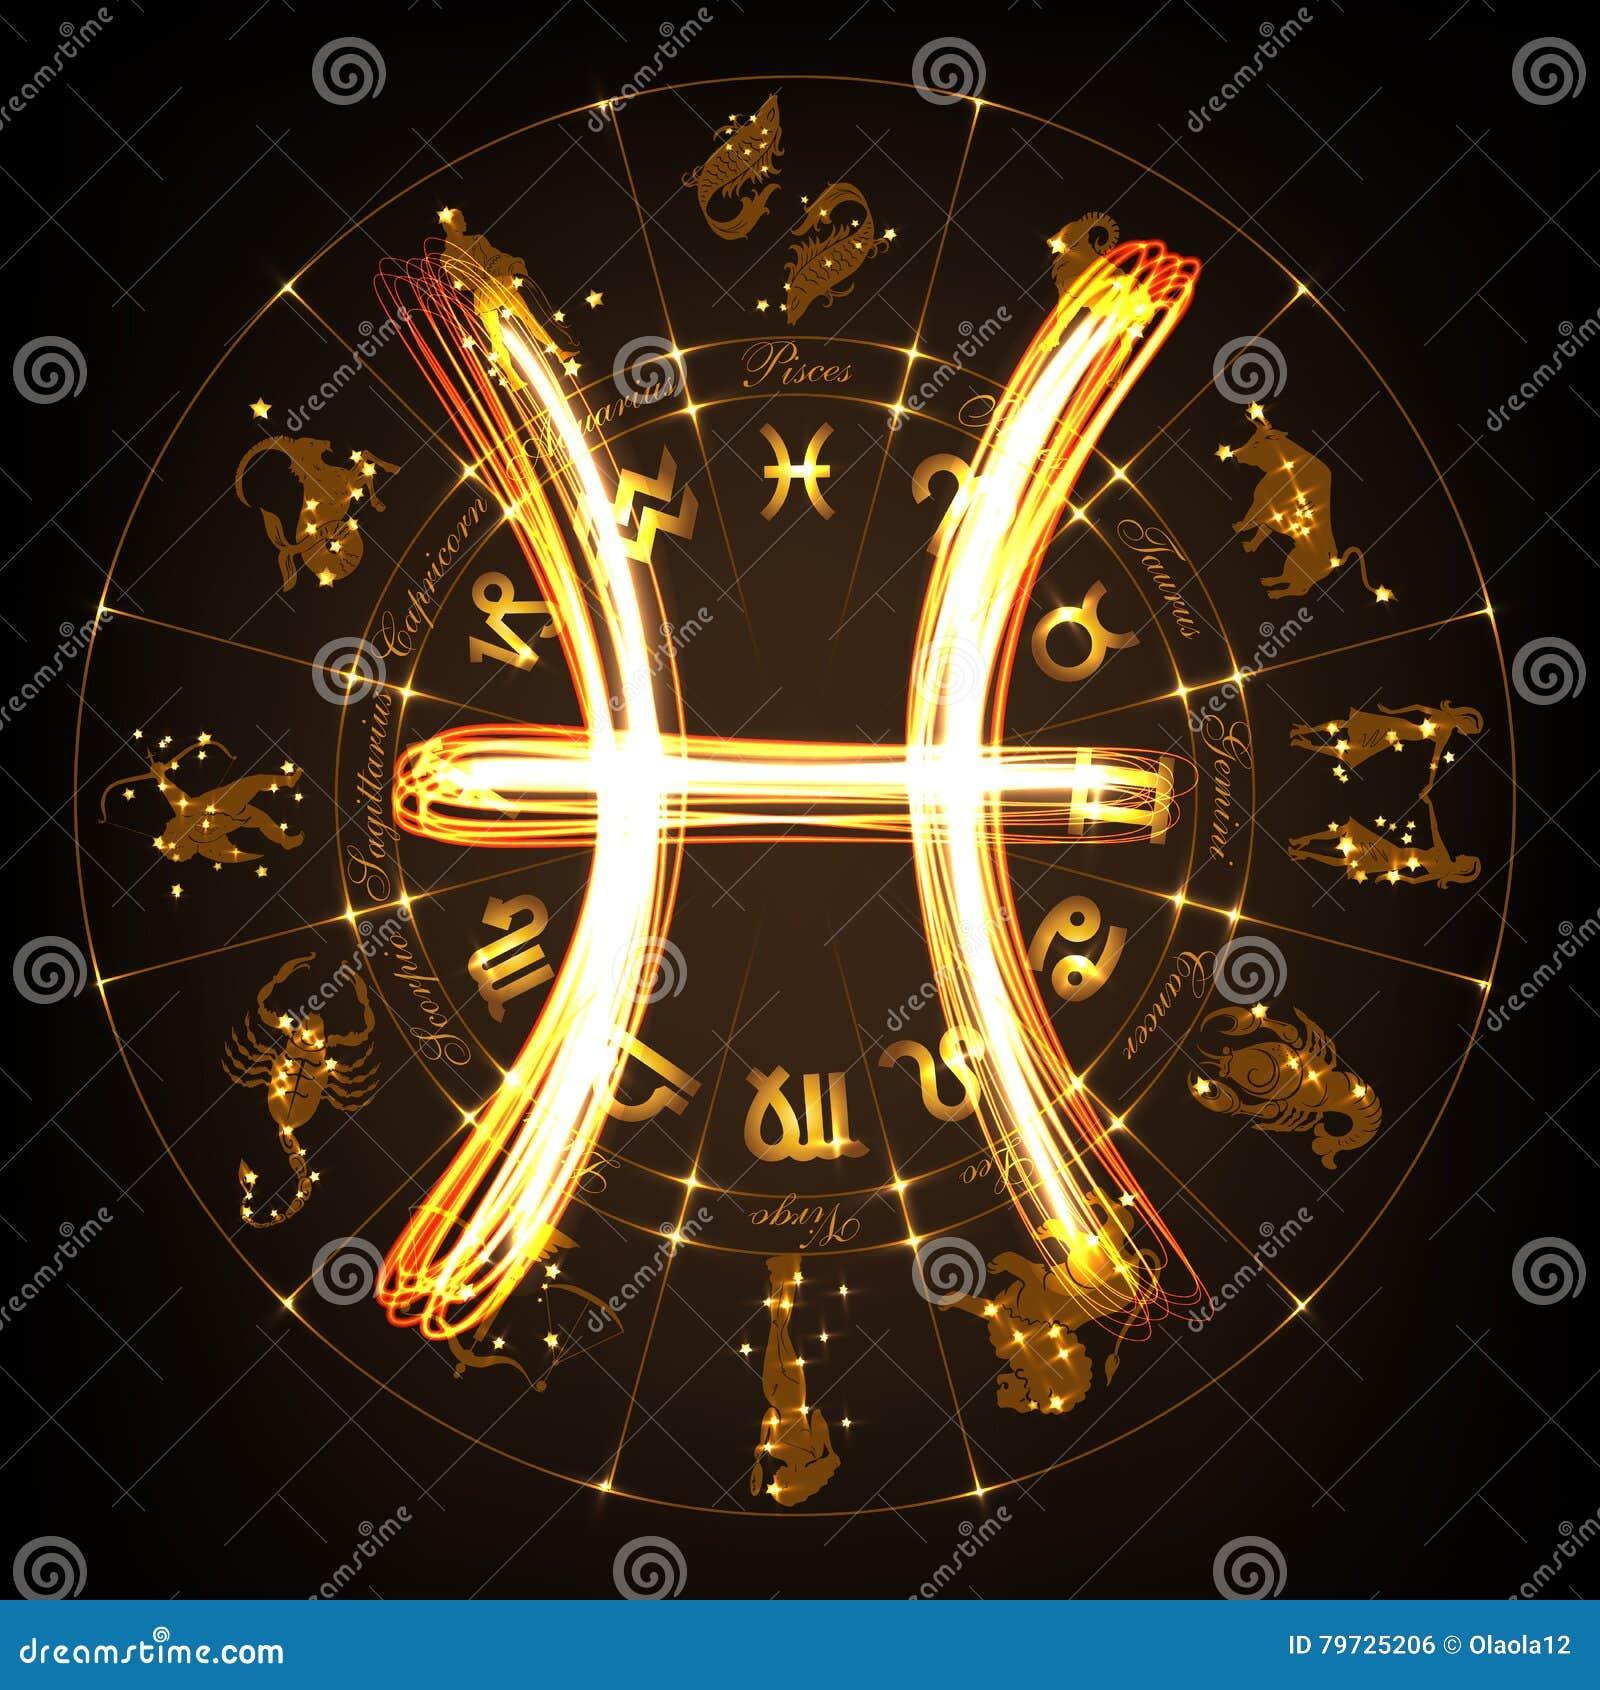 Muestra Piscis del zodiaco